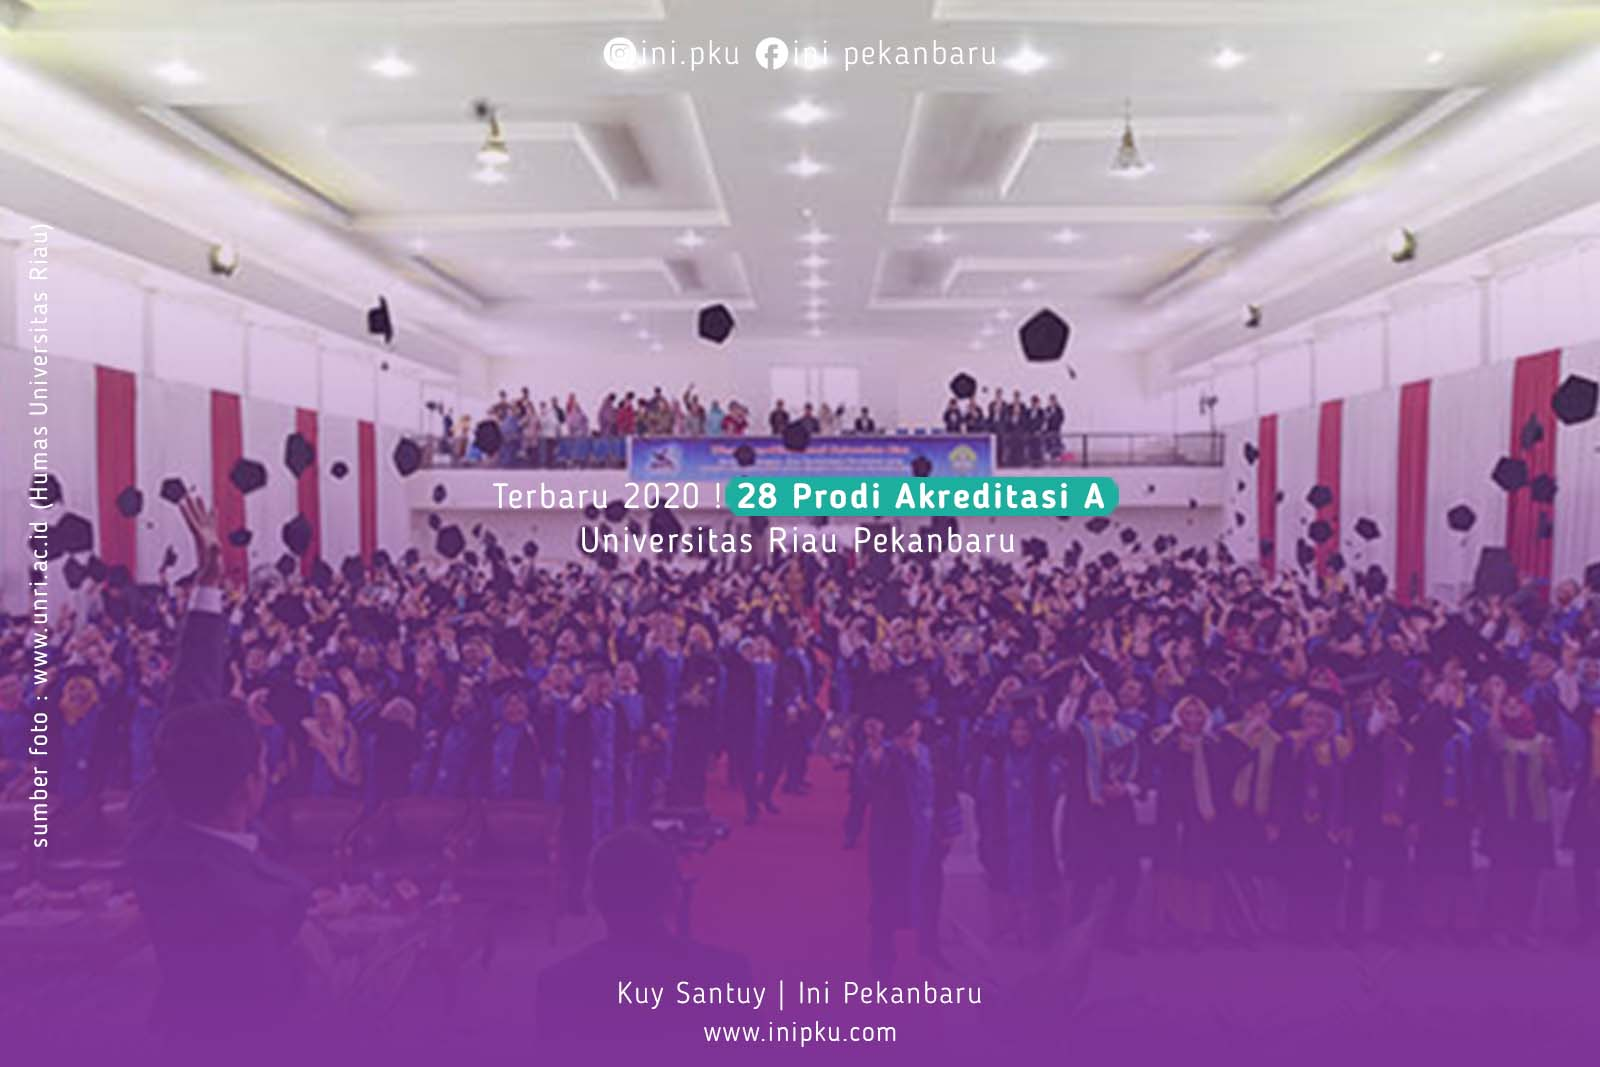 Terbaru ! 28 Prodi Akreditasi A Universitas Riau Pekanbaru